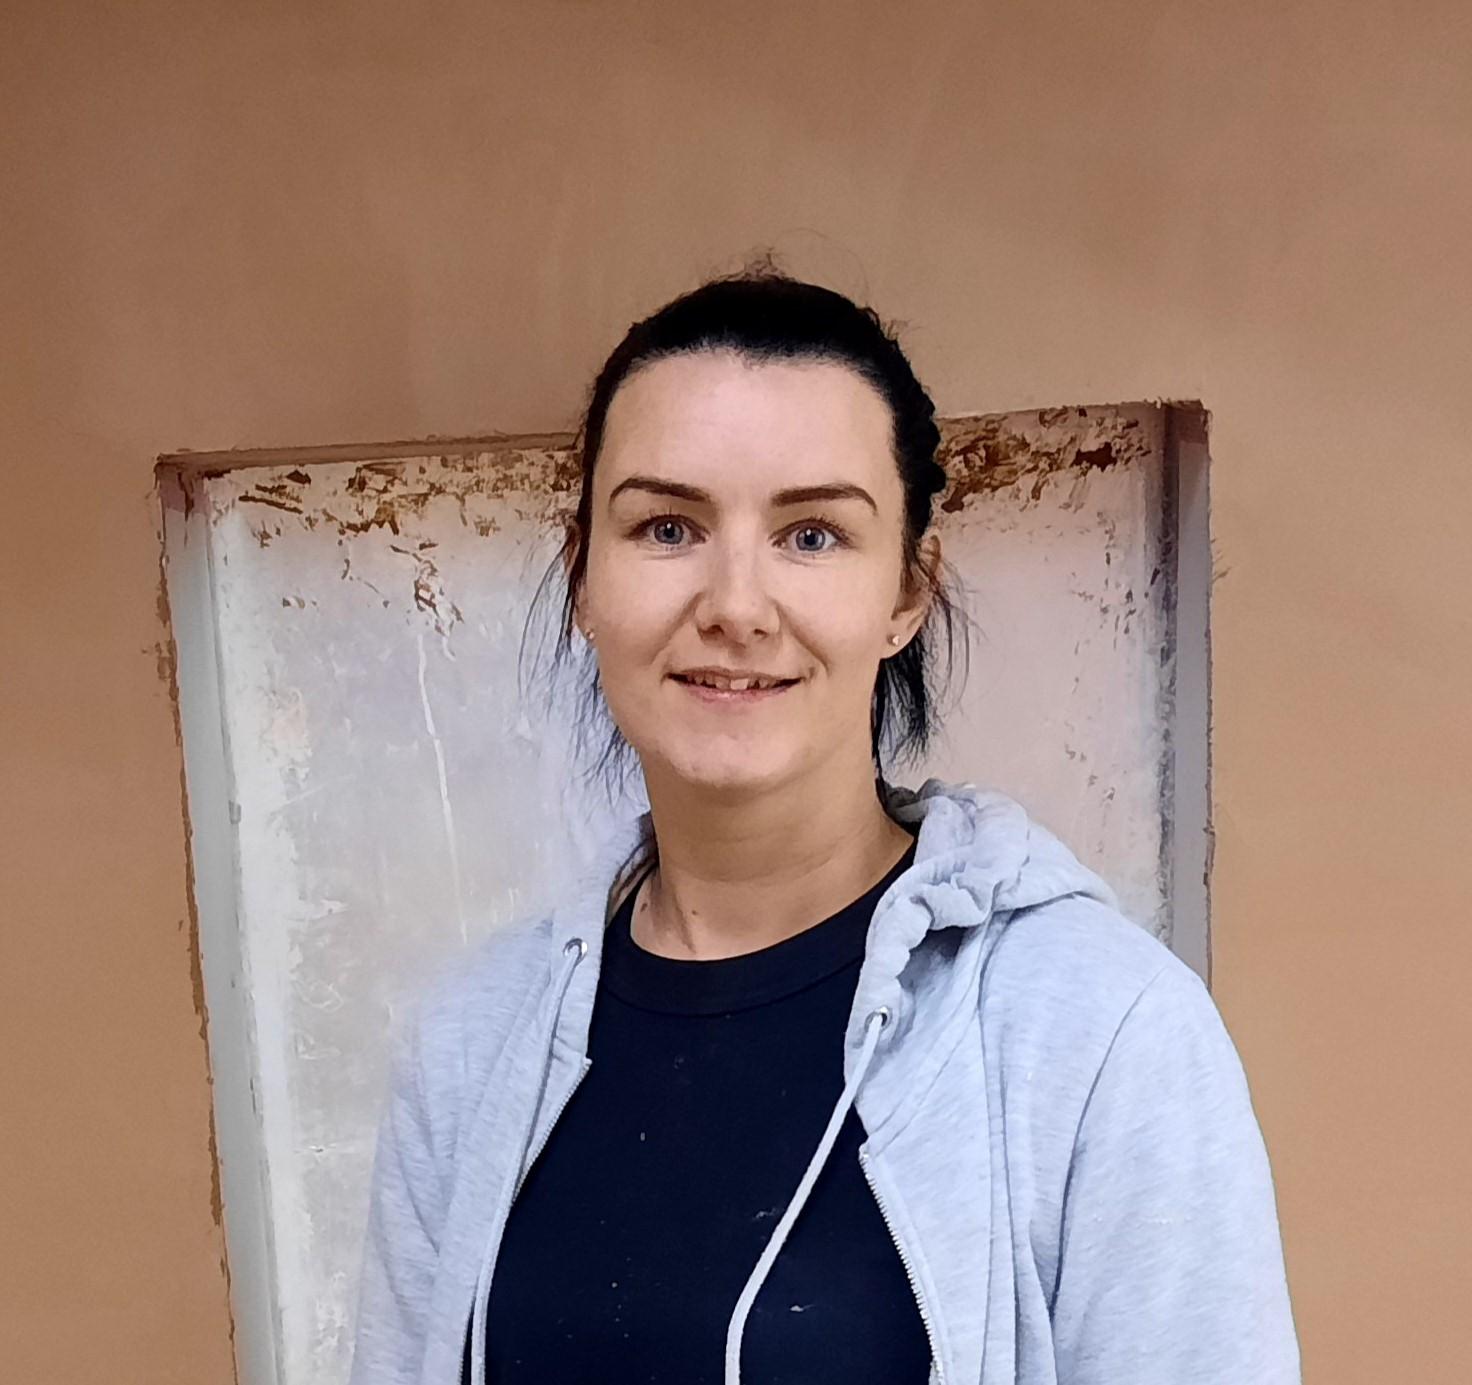 Terri Jade Huddersfield